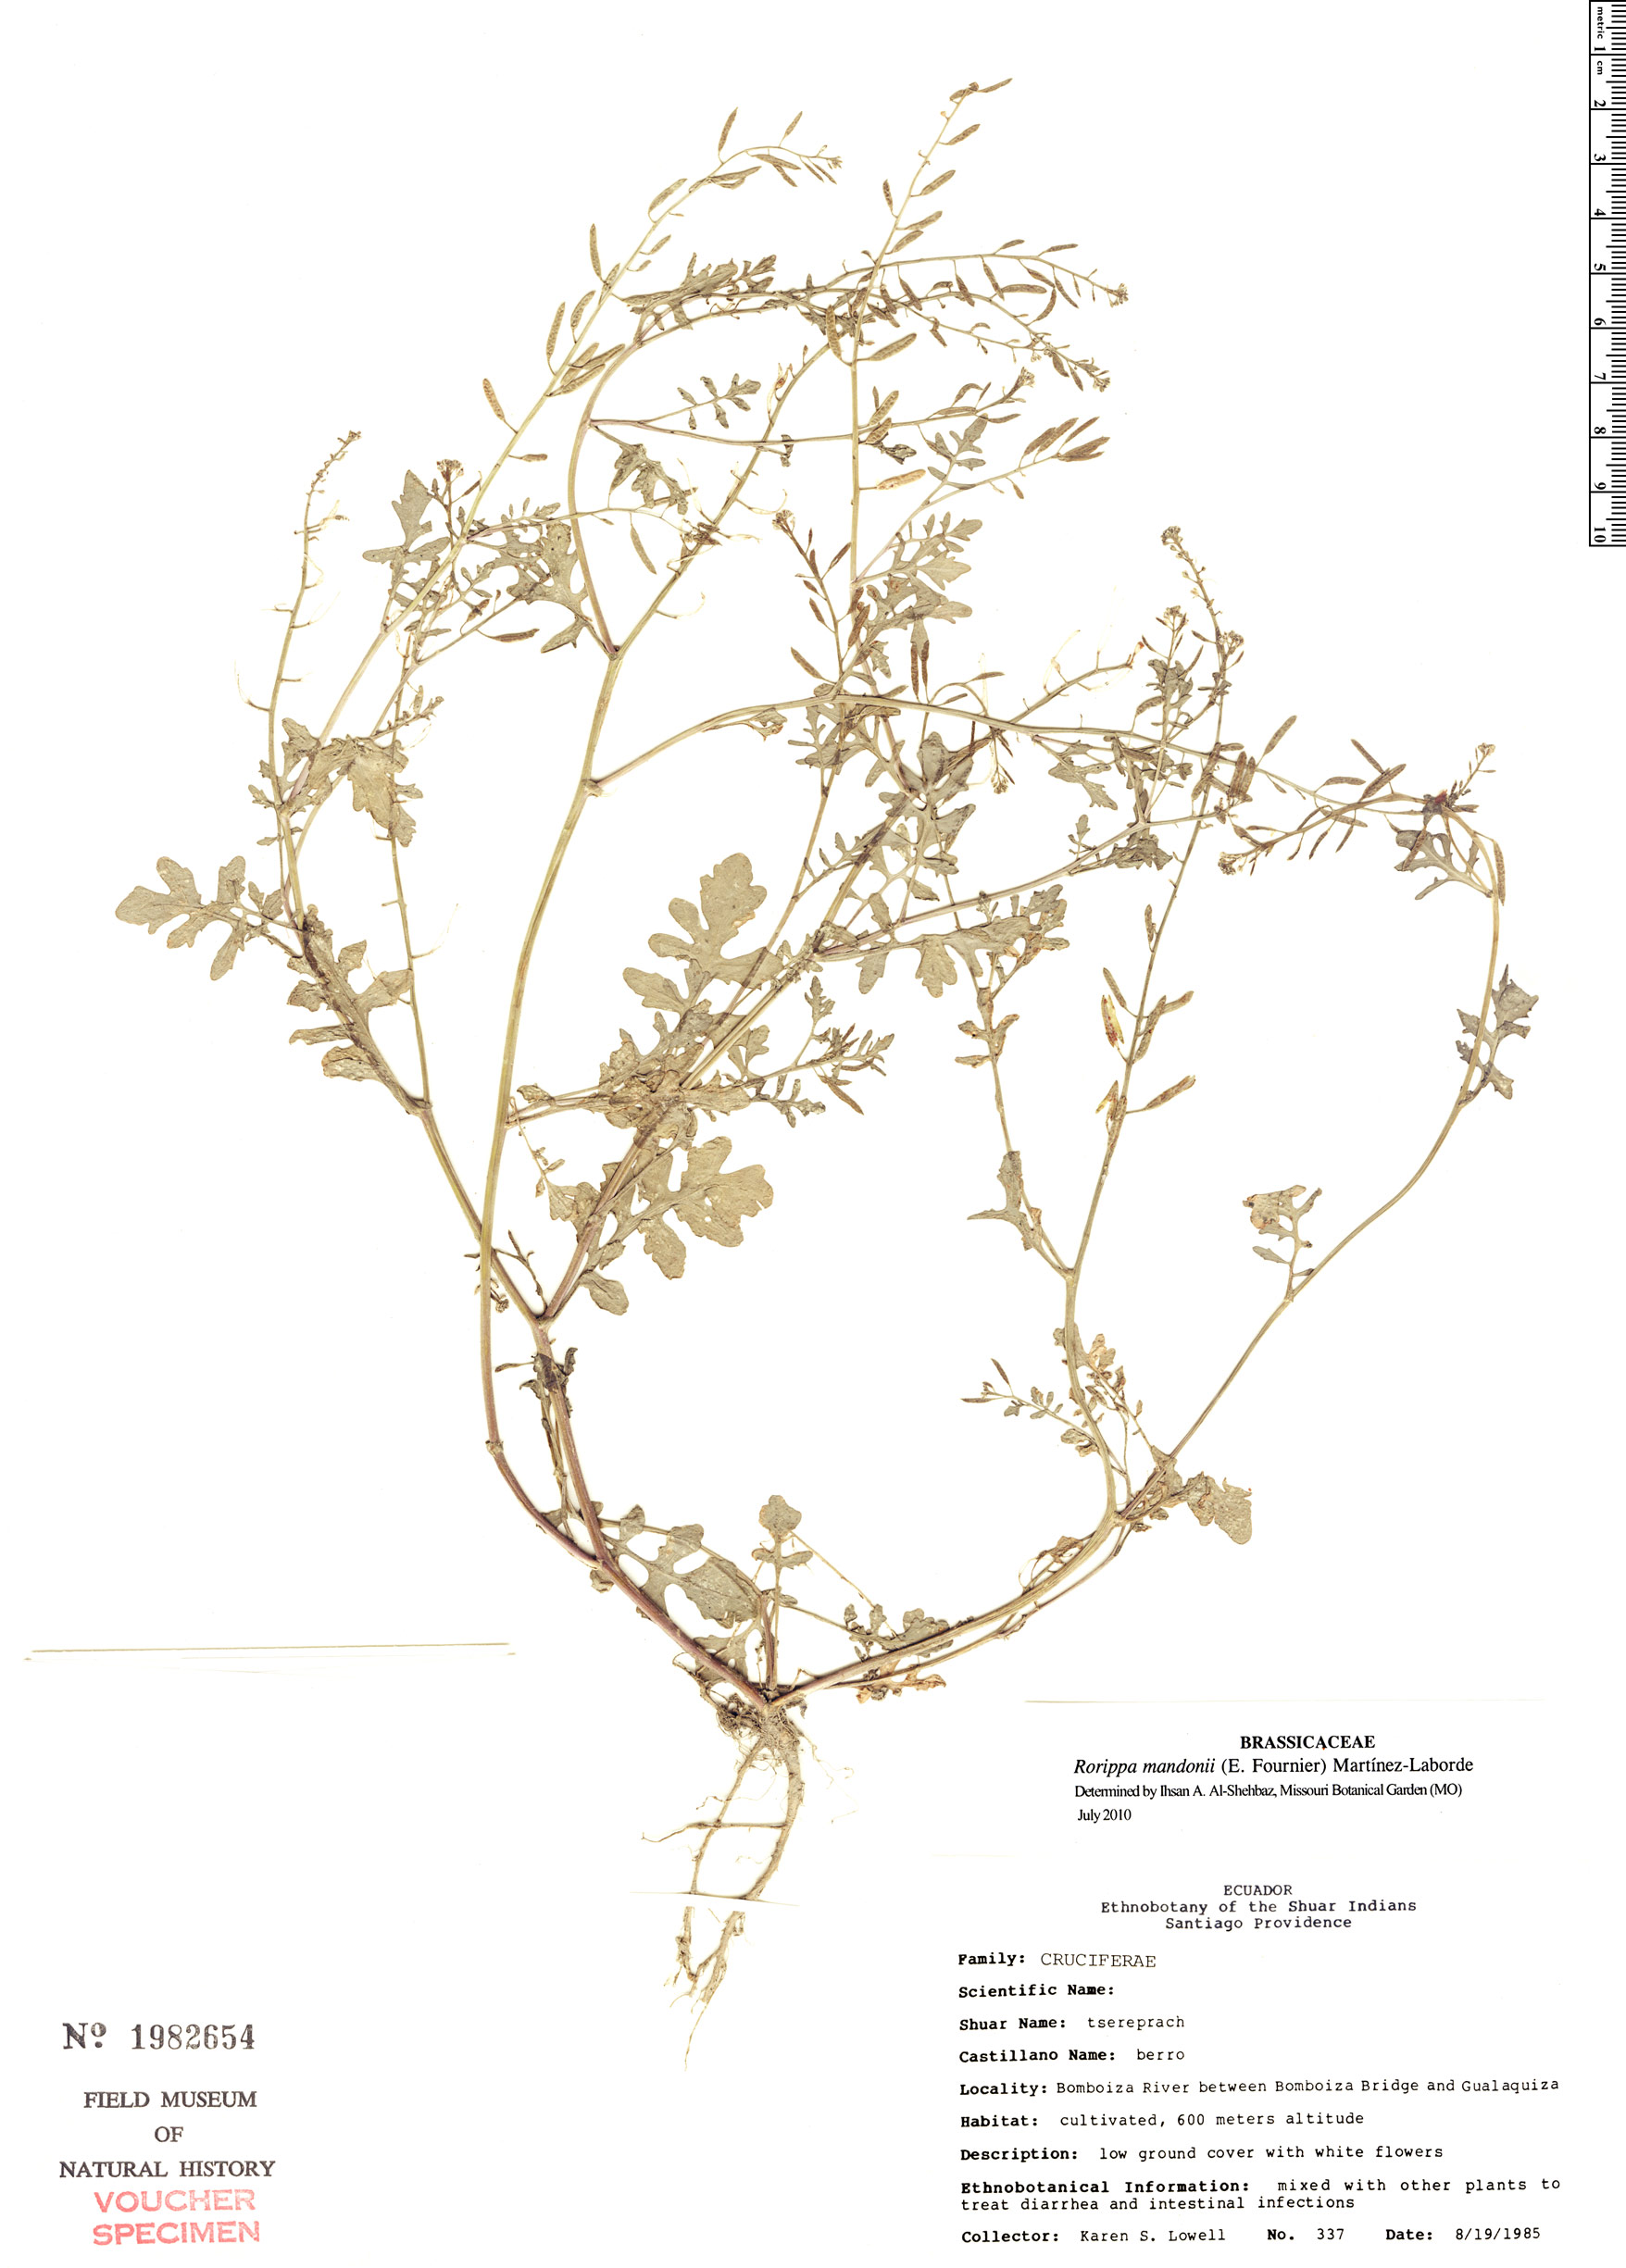 Espécimen: Rorippa mandonii